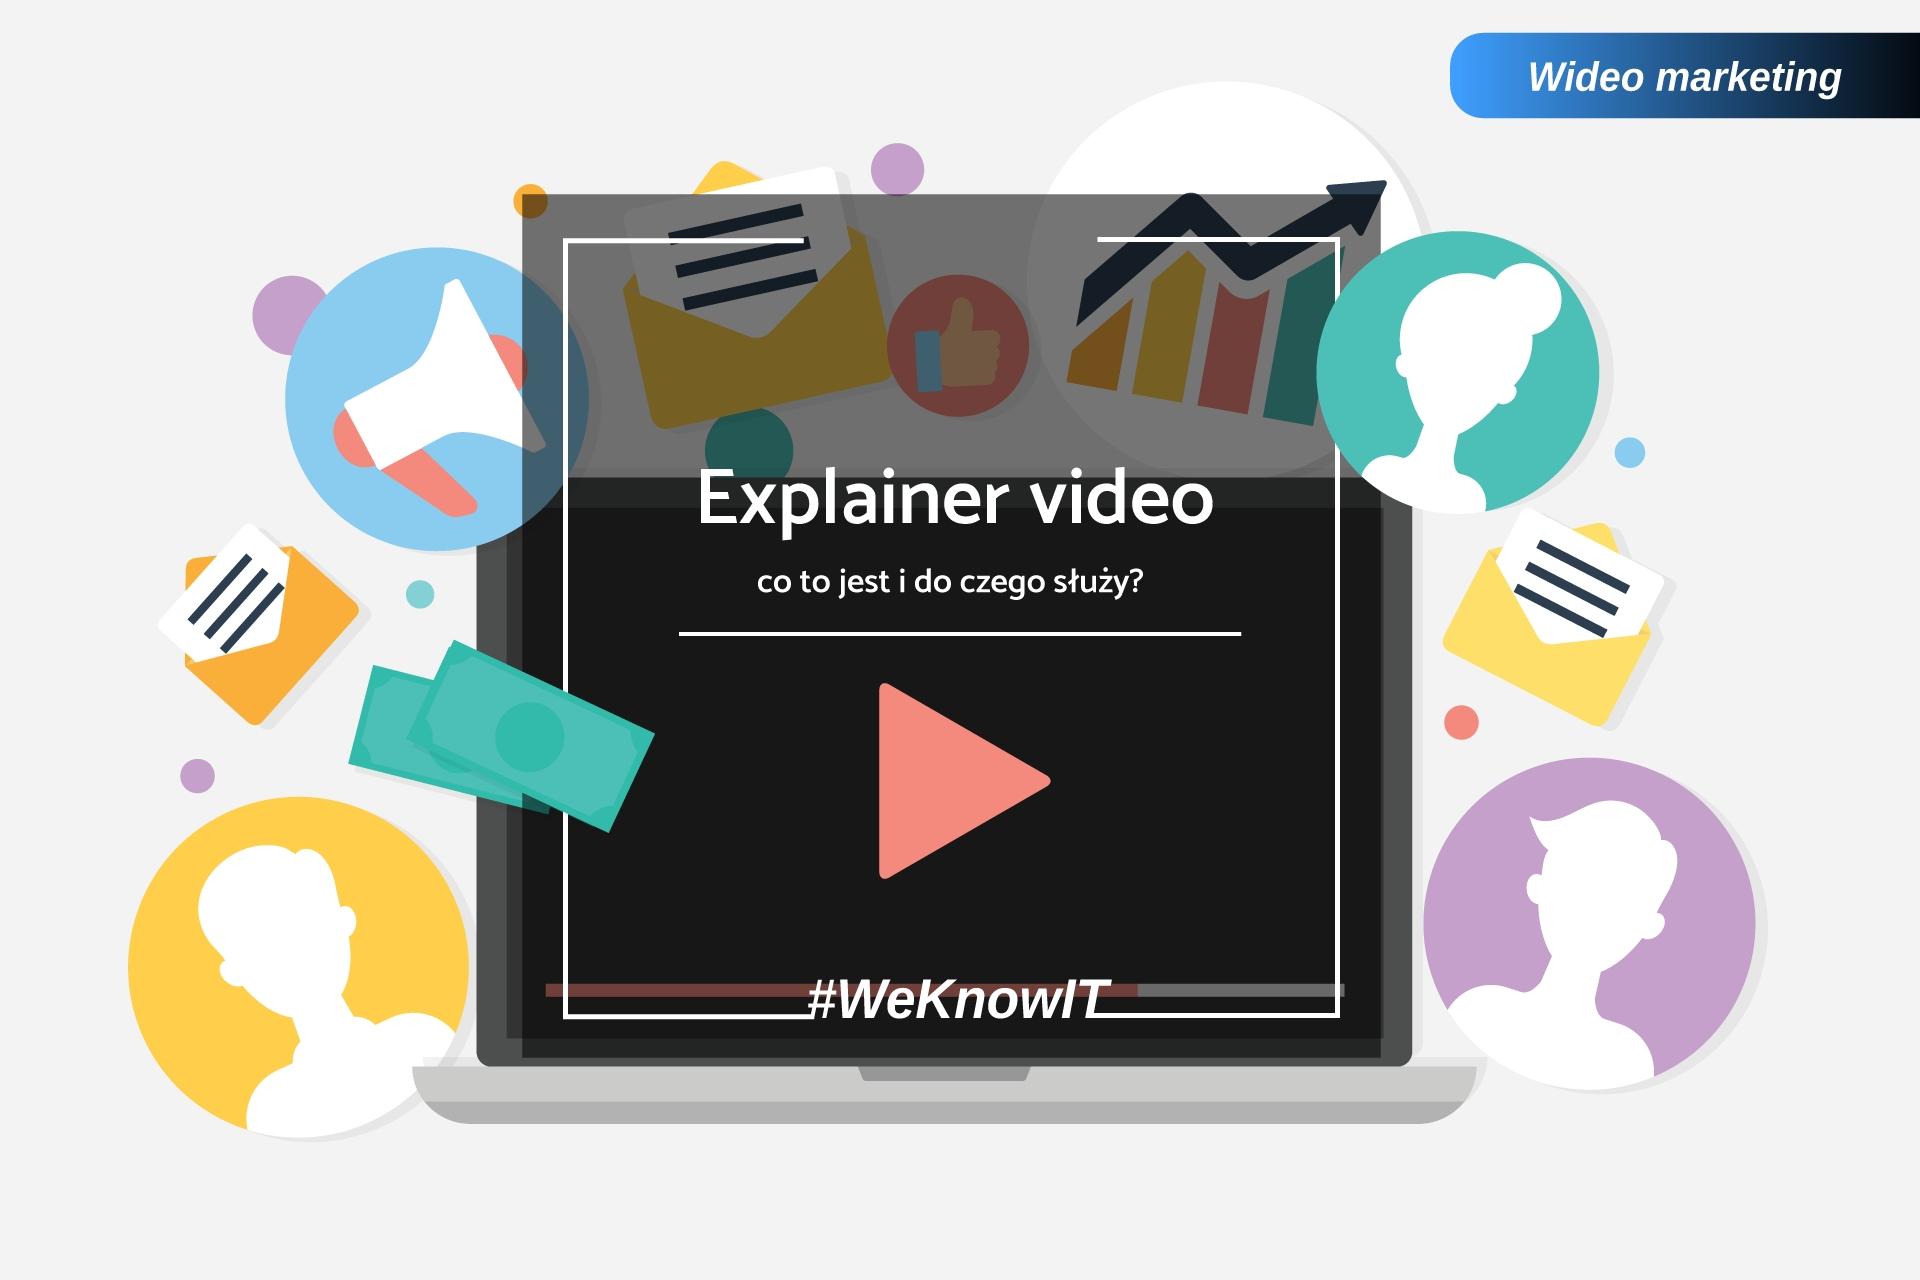 Explainer video co to jest explainer video cena explainer video polska knowIT Toruń produkcja filmowa animacje 1